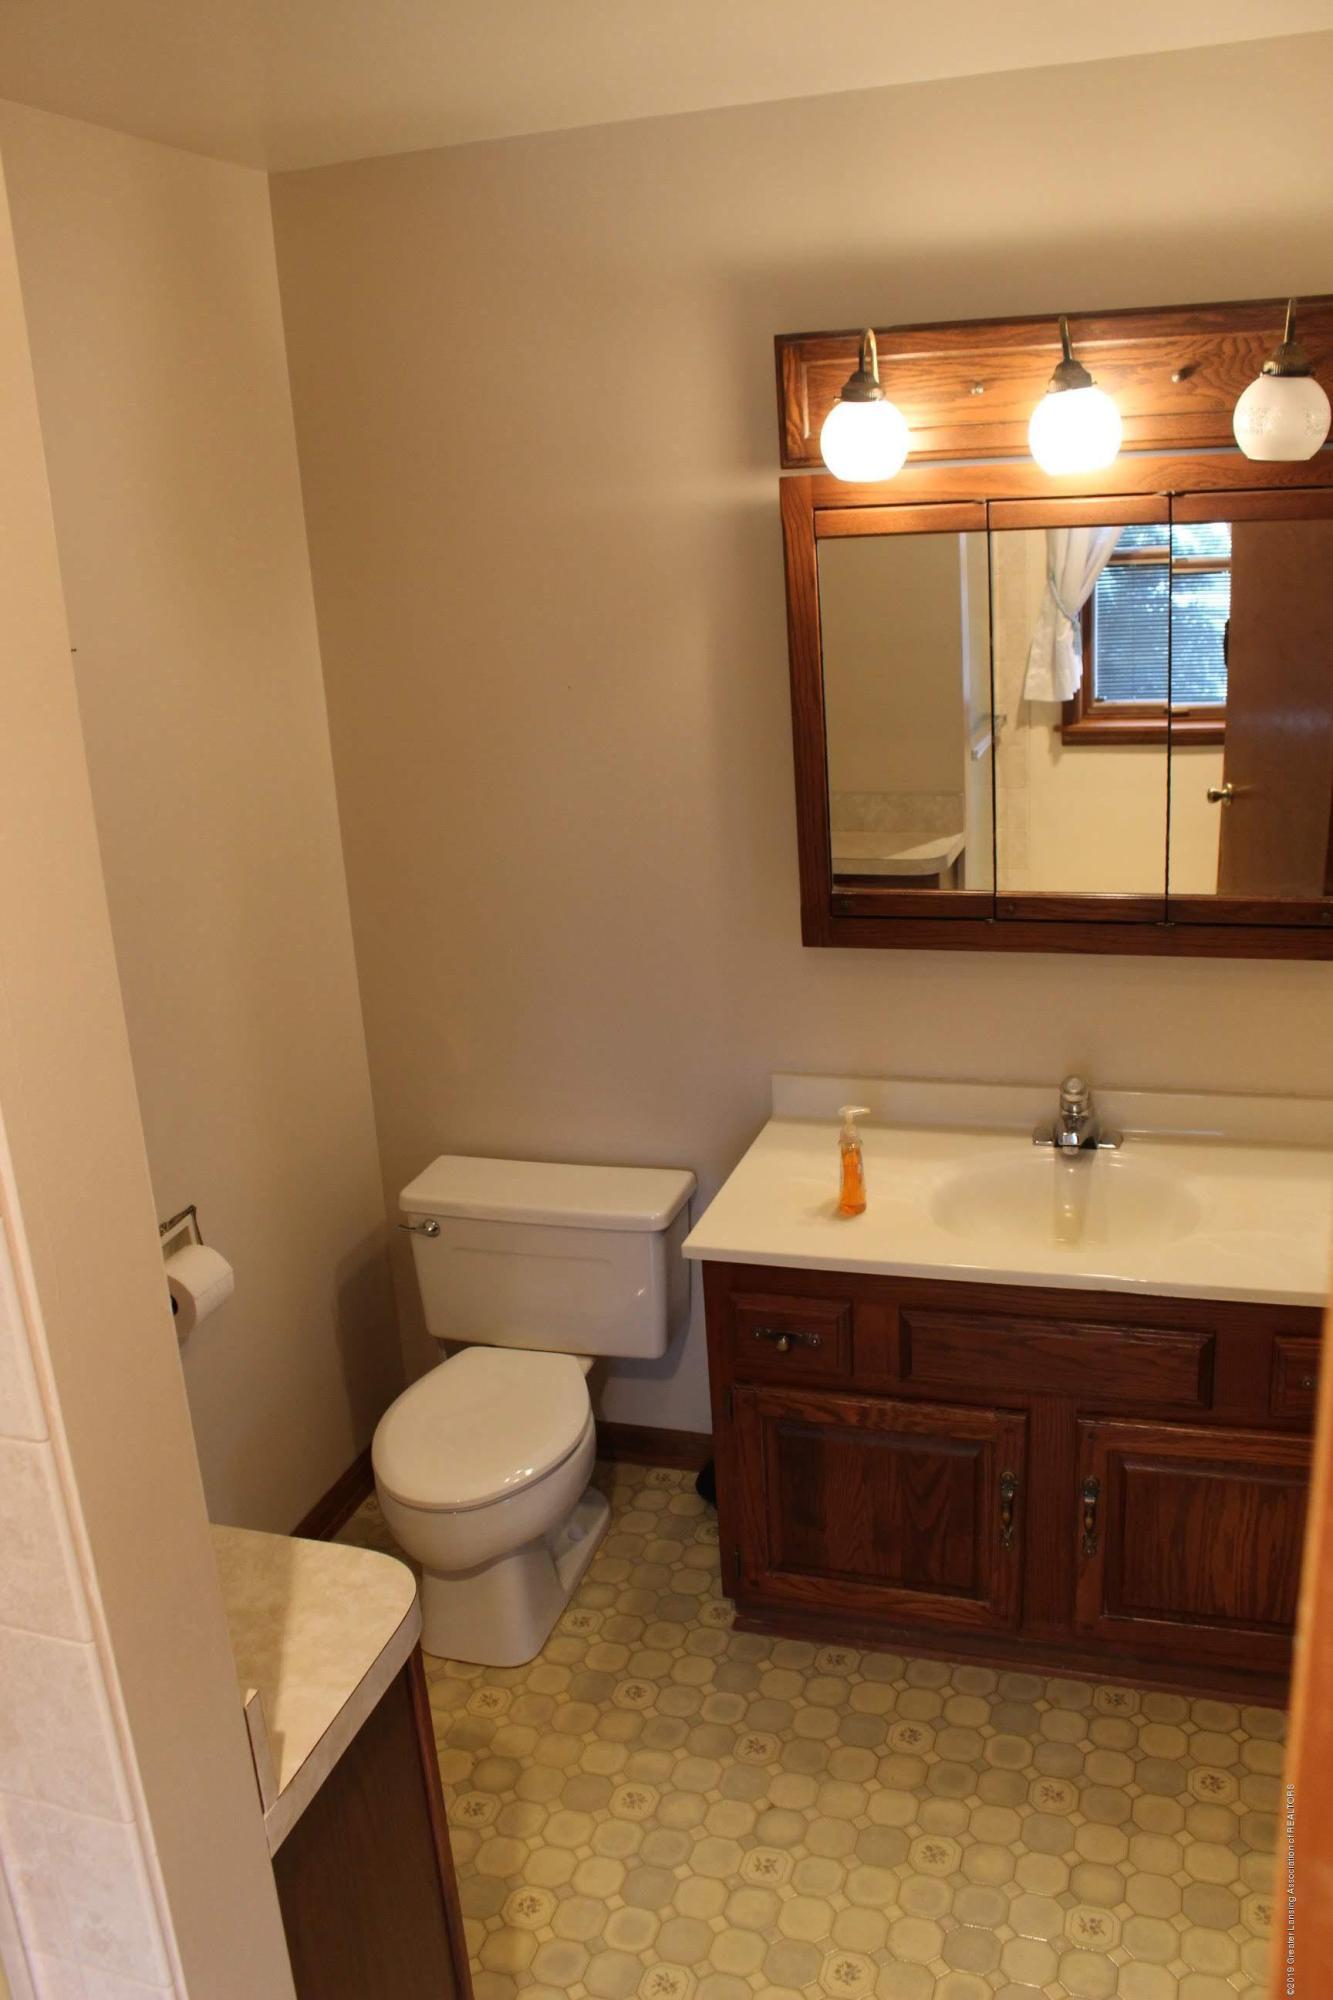 436 N Maple St - Master Suite Bathroom - 13